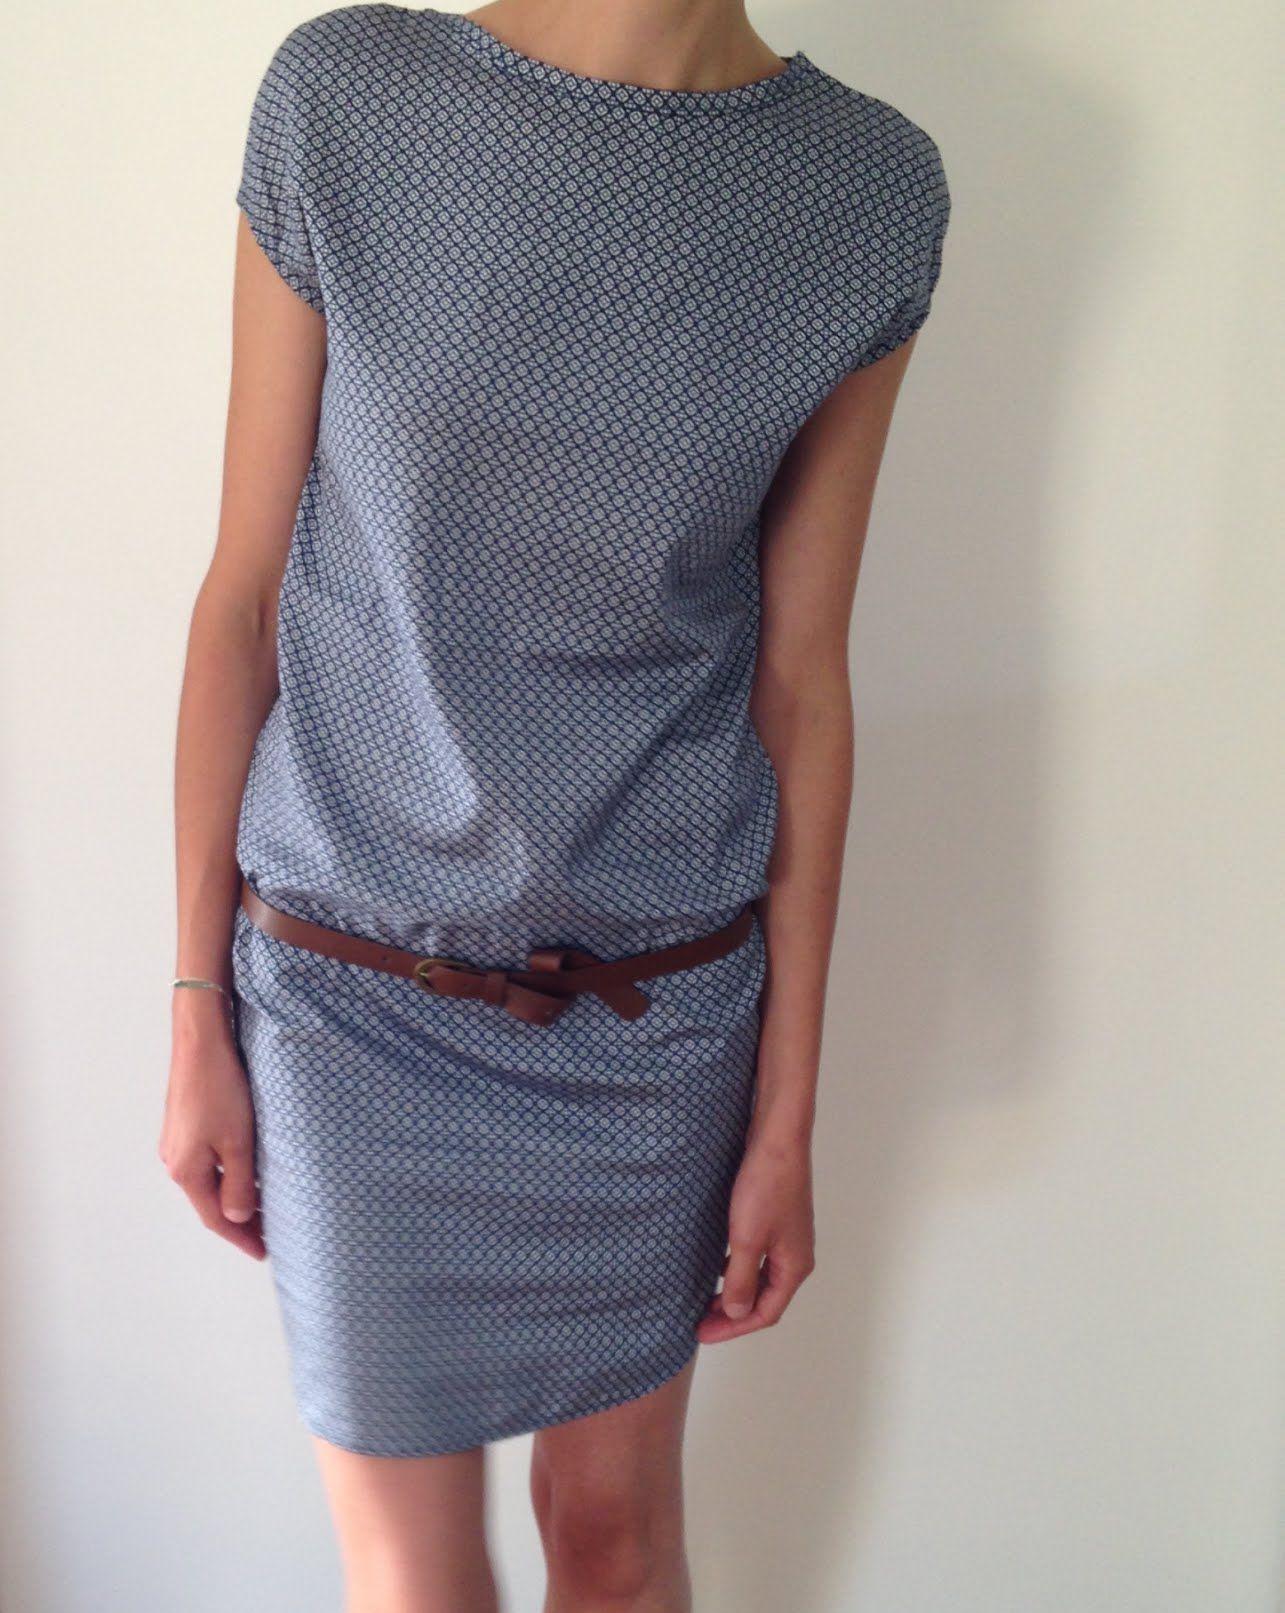 a01bfd4e2b5 Tuto couture Robe Femme Handmade Coupe droite Nantes